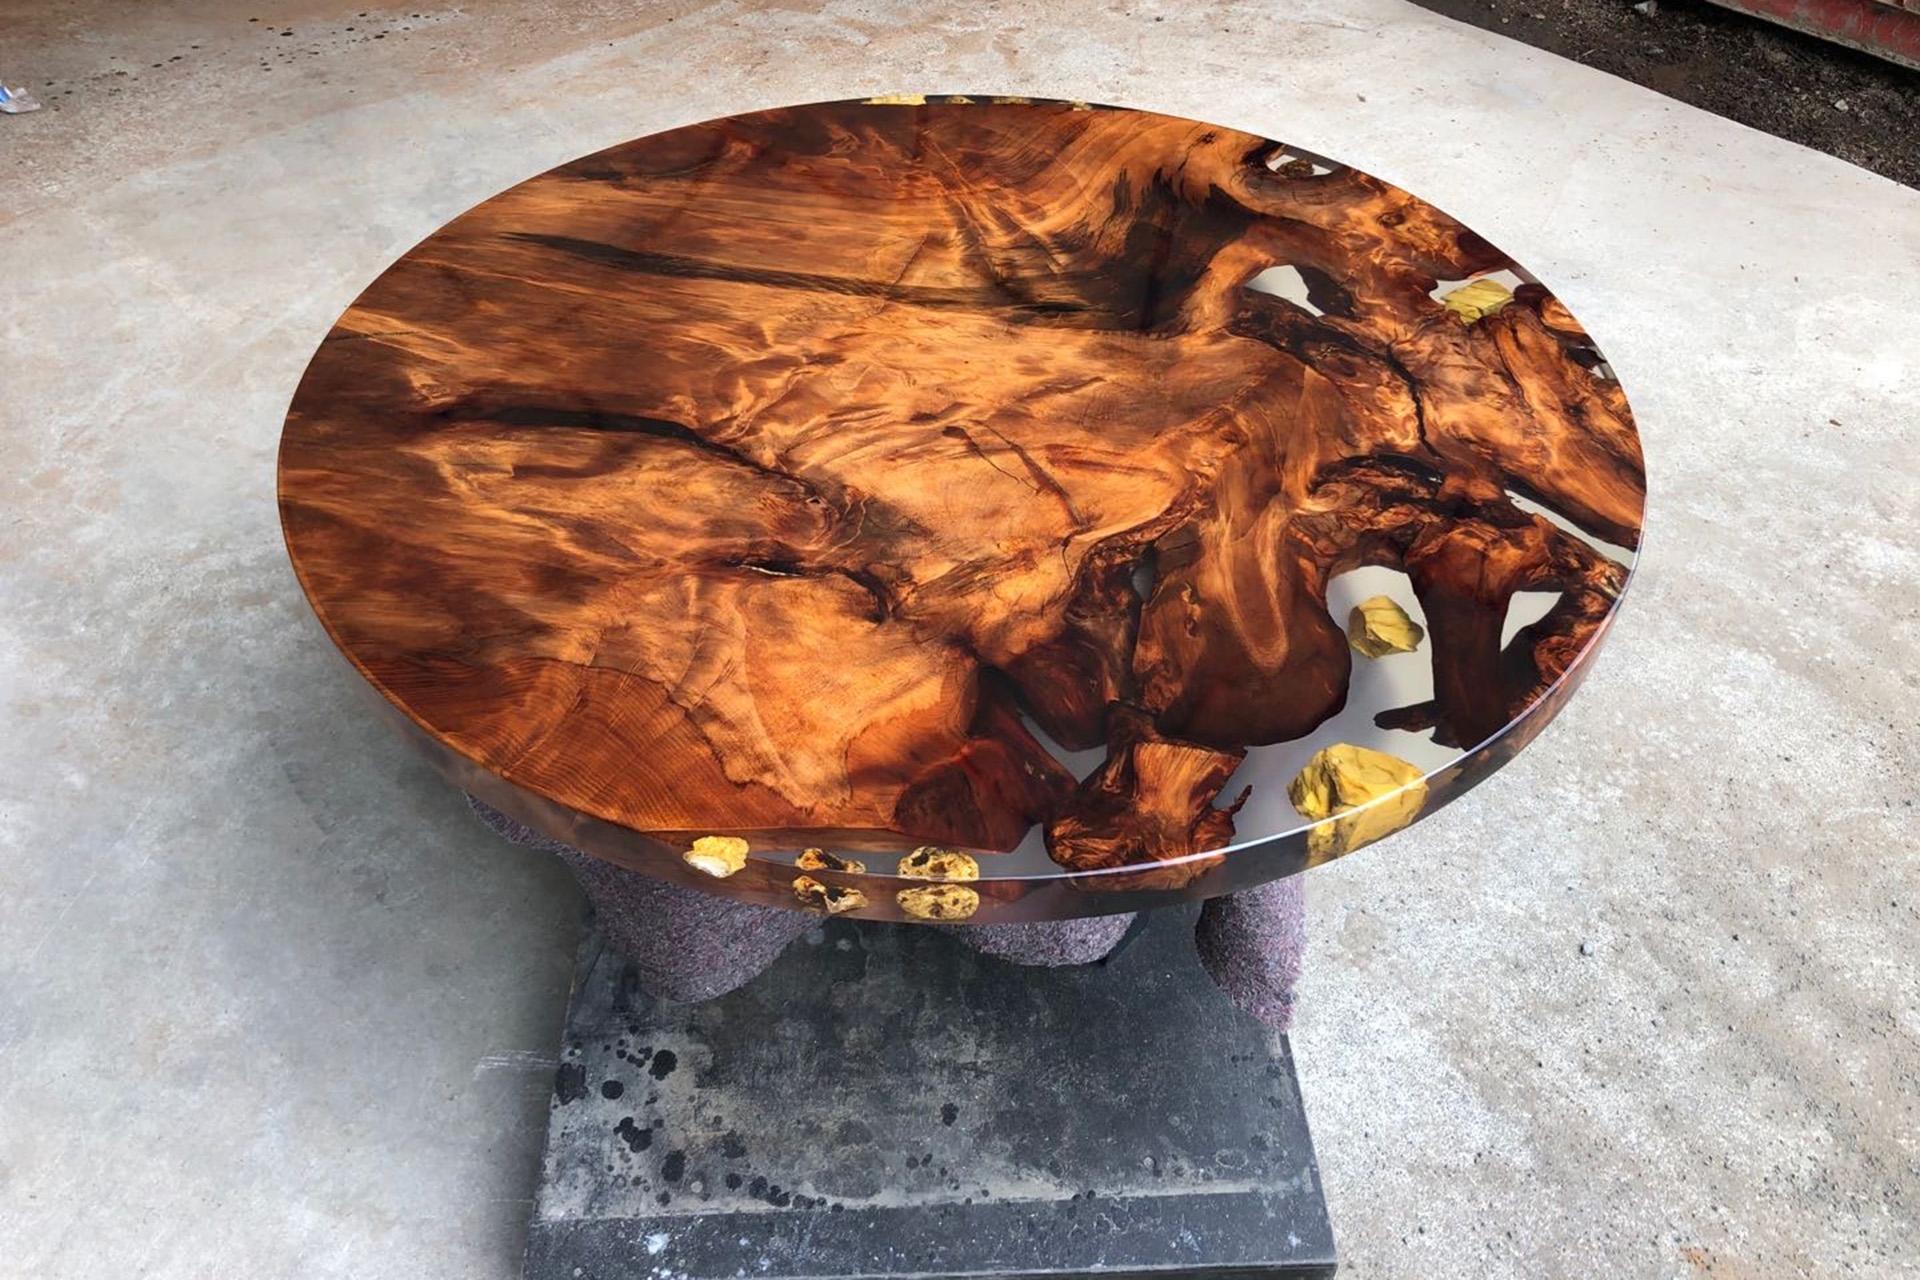 Golden Age Icewood Kauri table